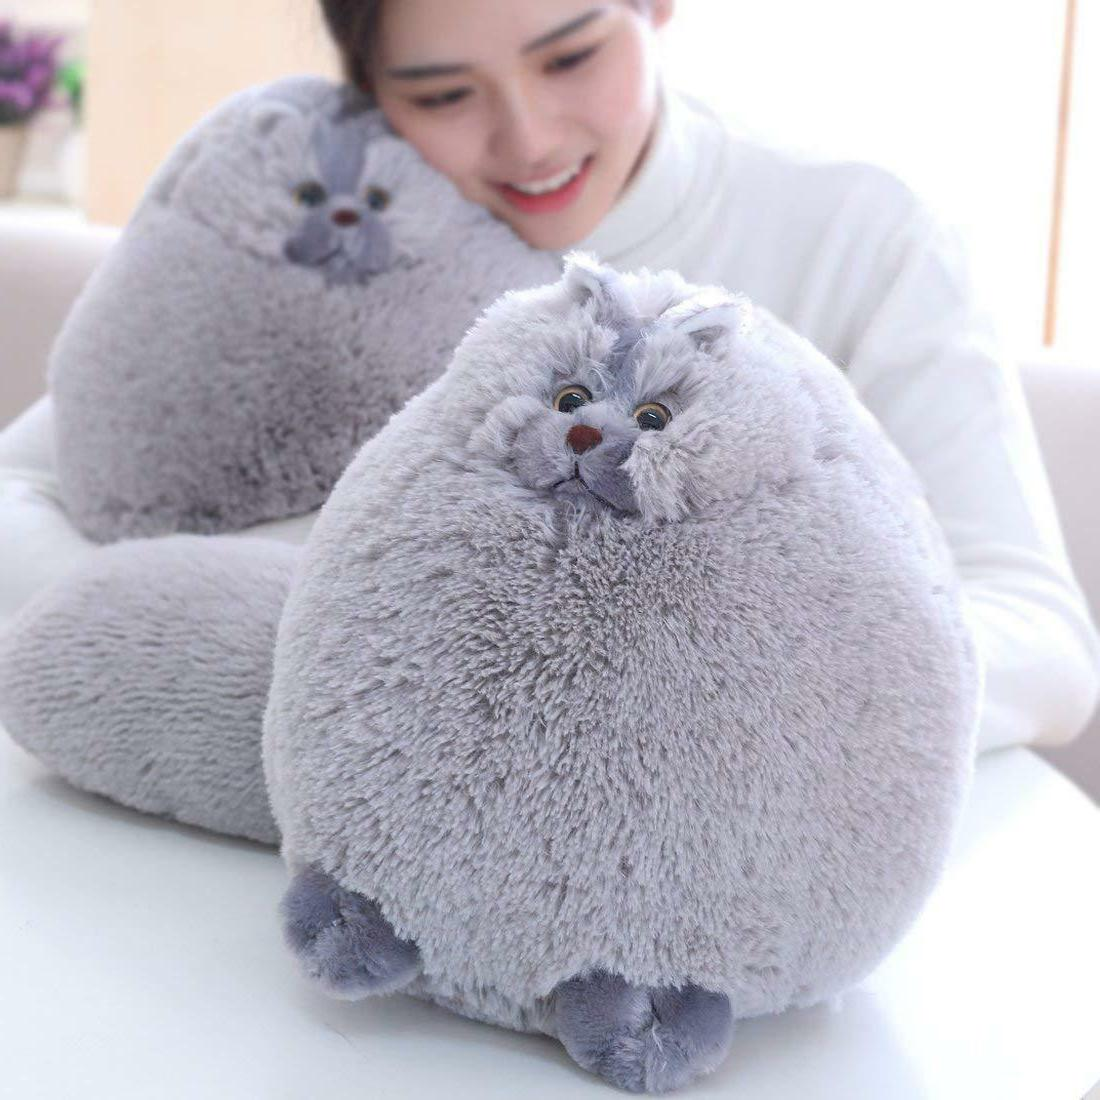 Winsterch Kids Fluffy Plush Cat Stuffed Cat Animal Toy Gray,